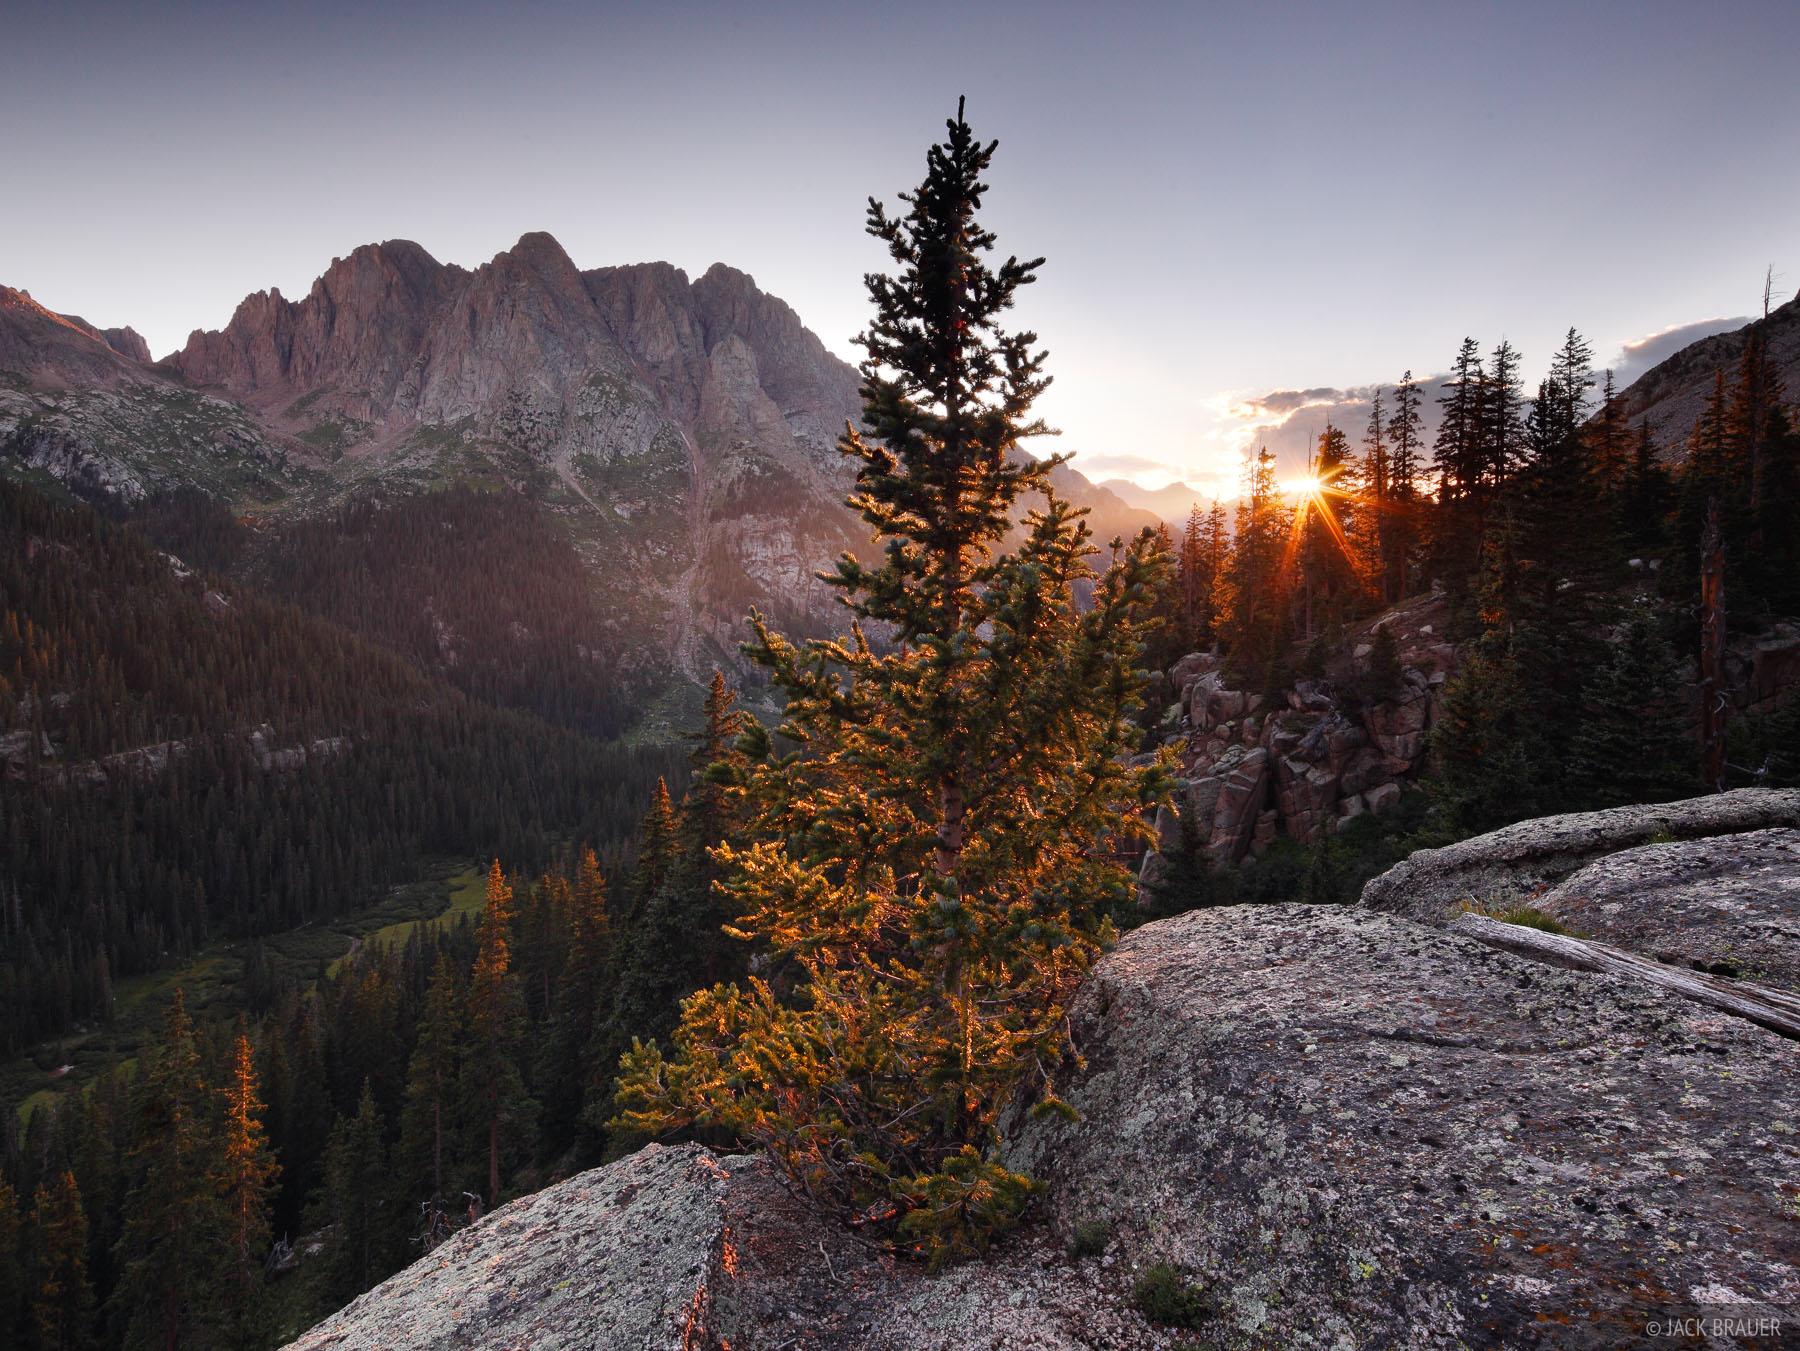 San Juan Mountains, Needle Mountains, Colorado, sunset, Weminuche Wilderness, photo